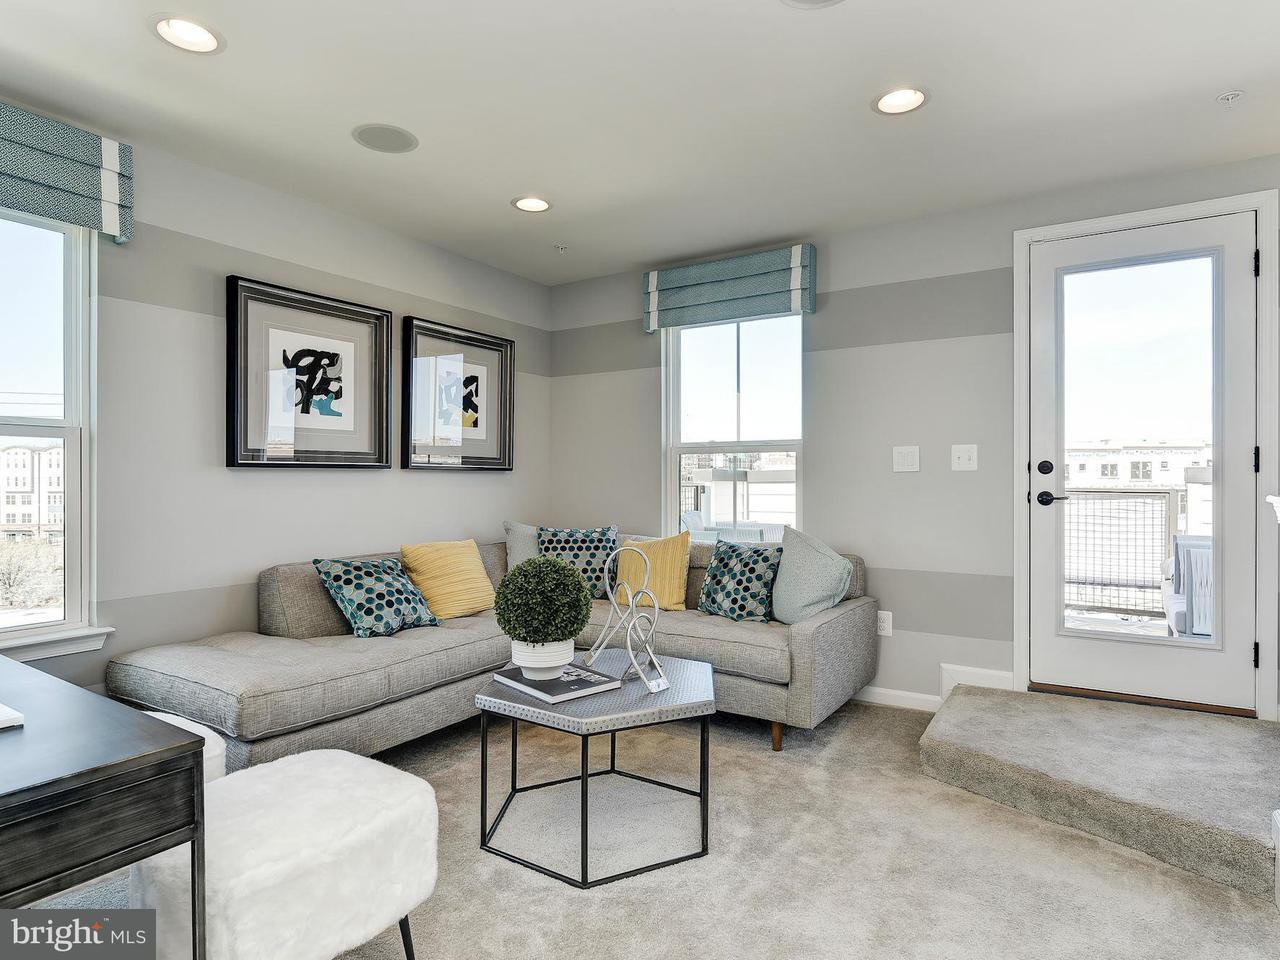 Additional photo for property listing at 3641 JAMISON ST NE 3641 JAMISON ST NE Washington, Distrito De Columbia 20018 Estados Unidos